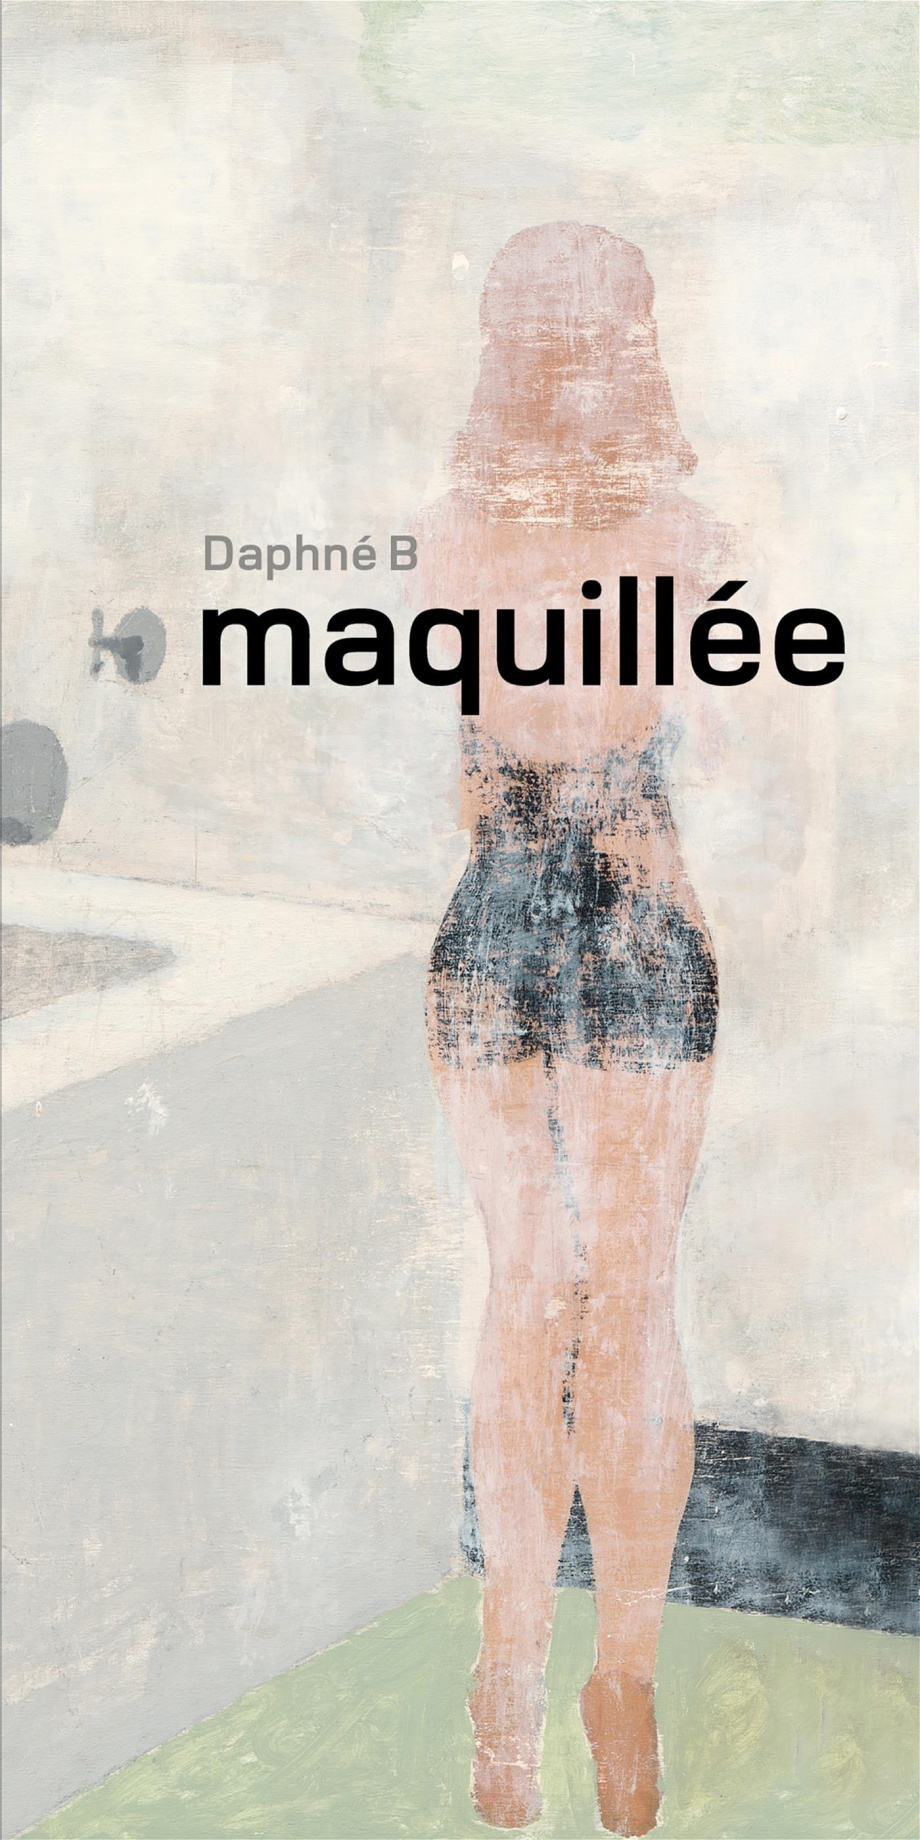 Daphné B.